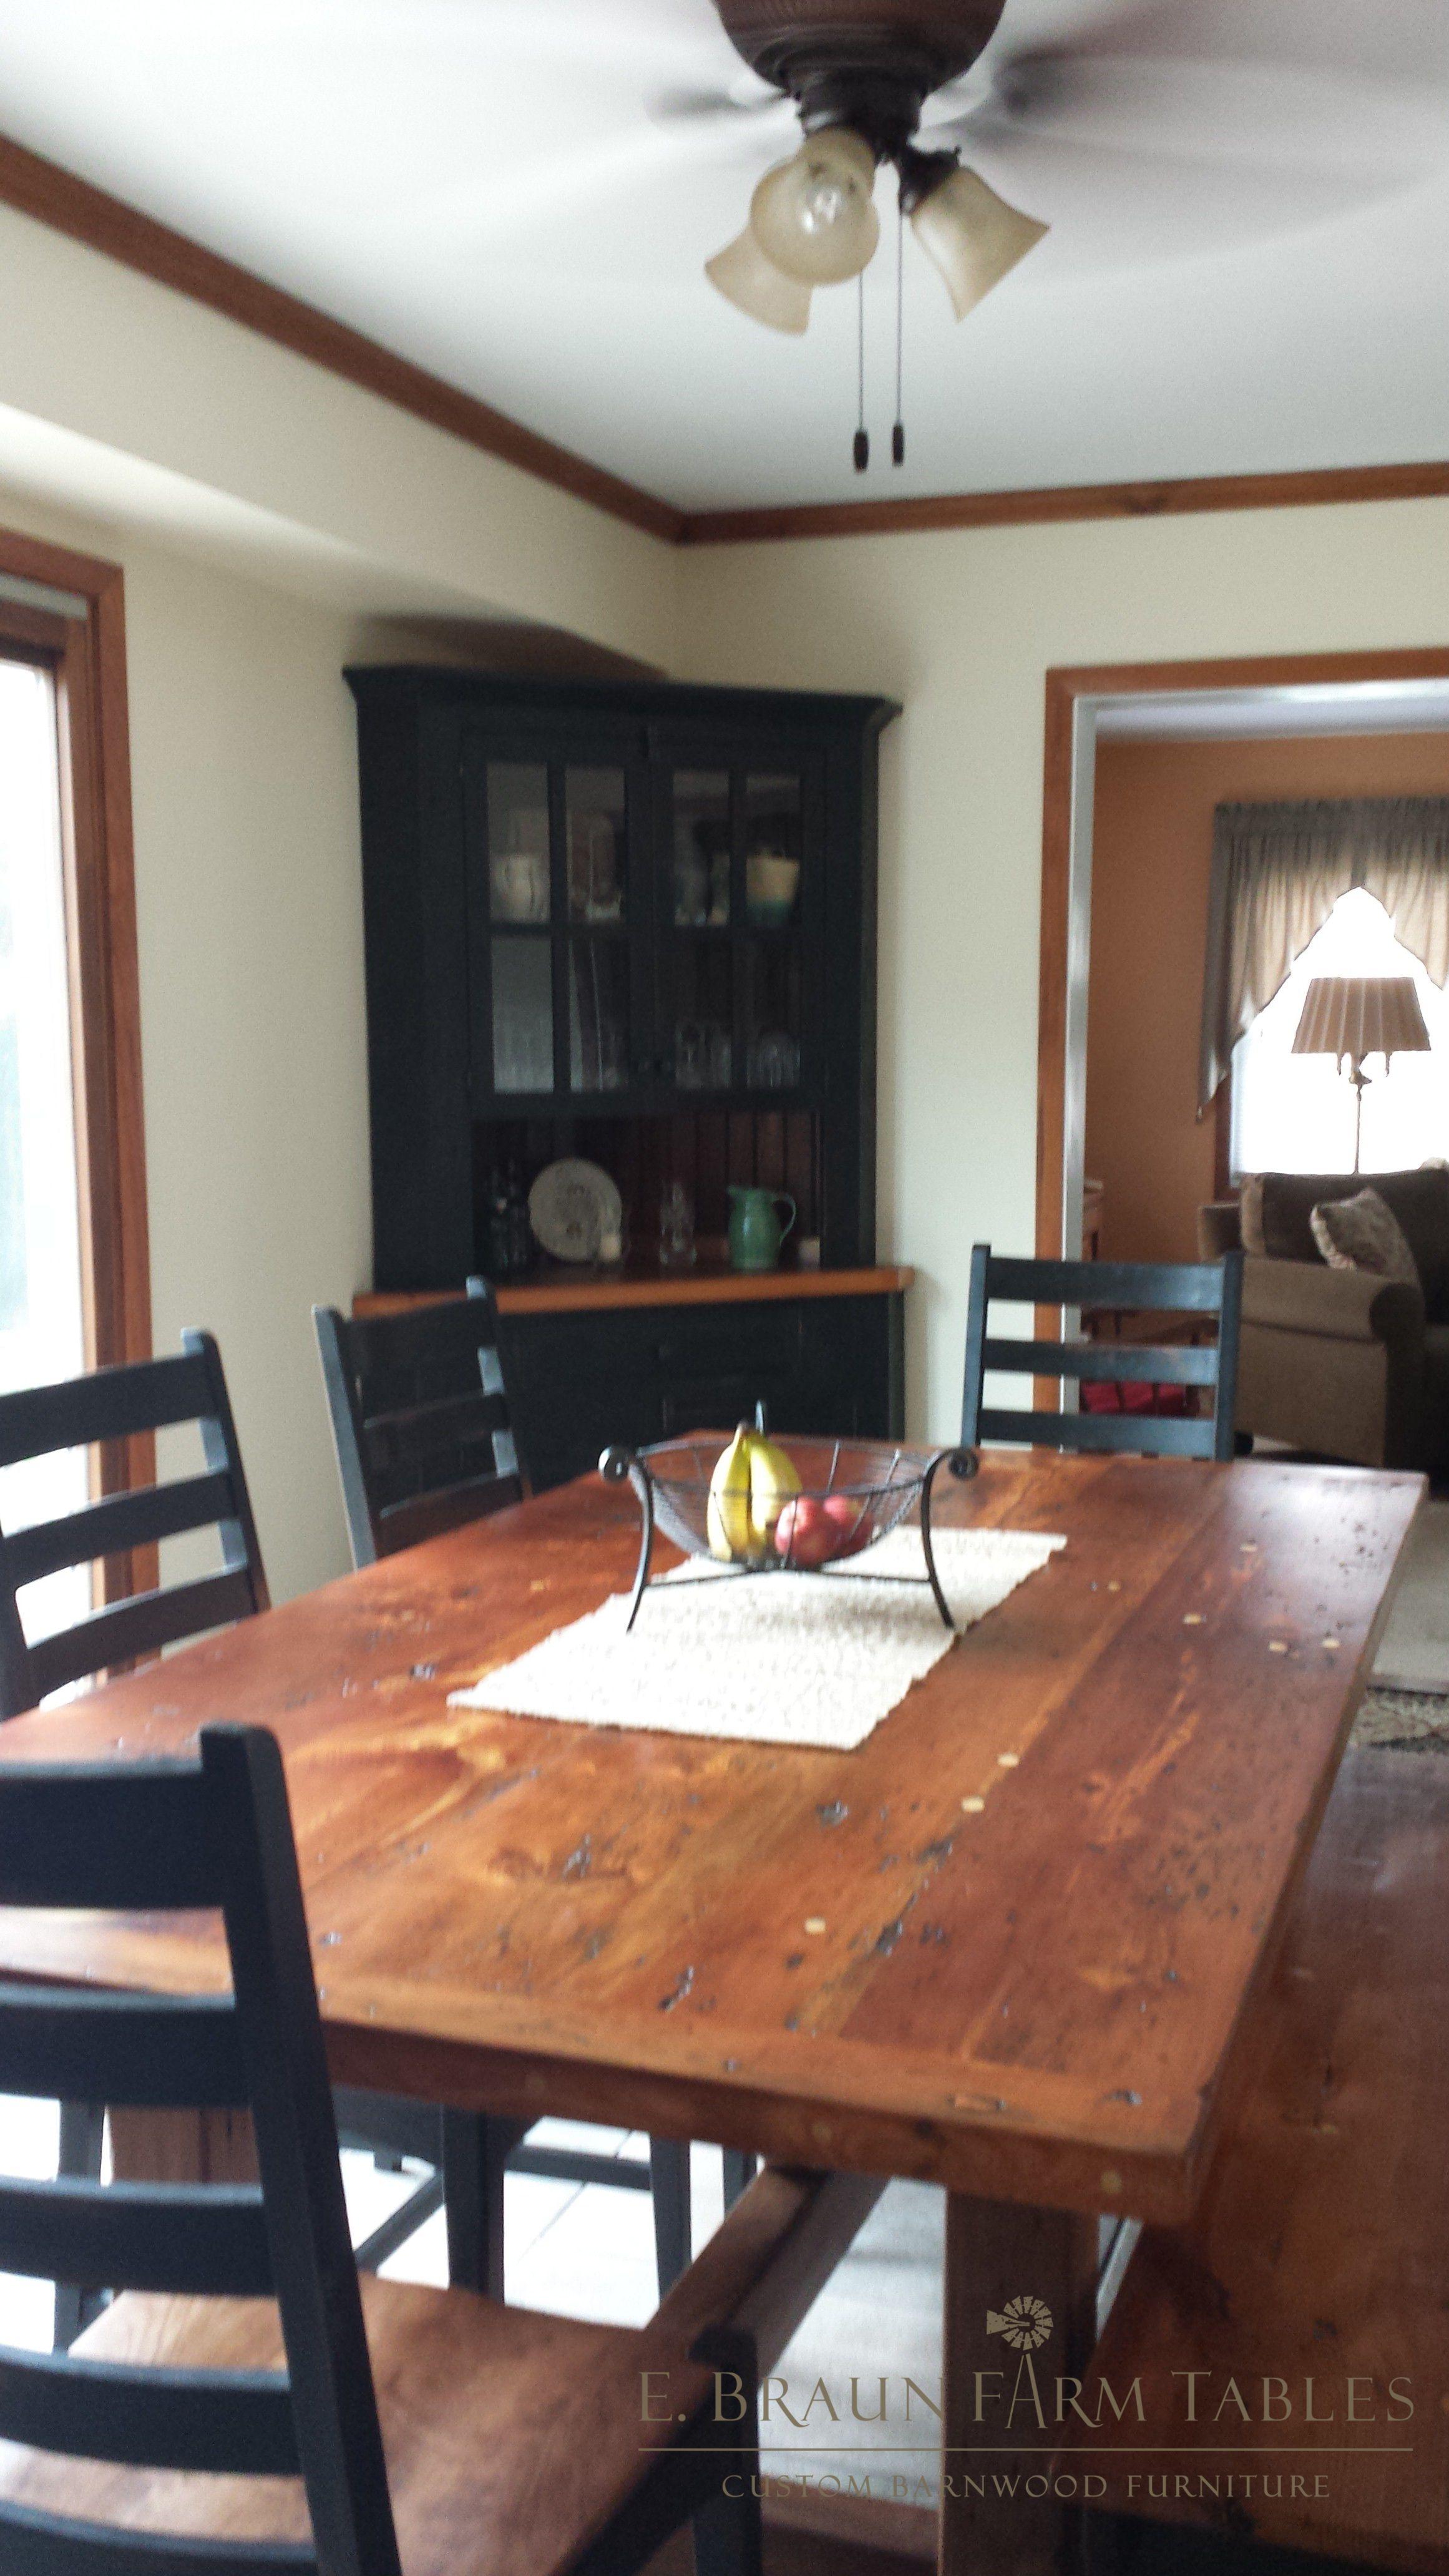 Sawbuck Trestle Table Corner Cabinet Bench Chairs E Braun Farm Tables